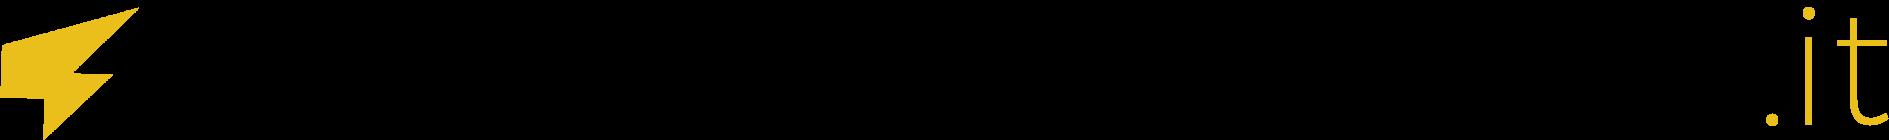 Logo francescoschettino.it 2x